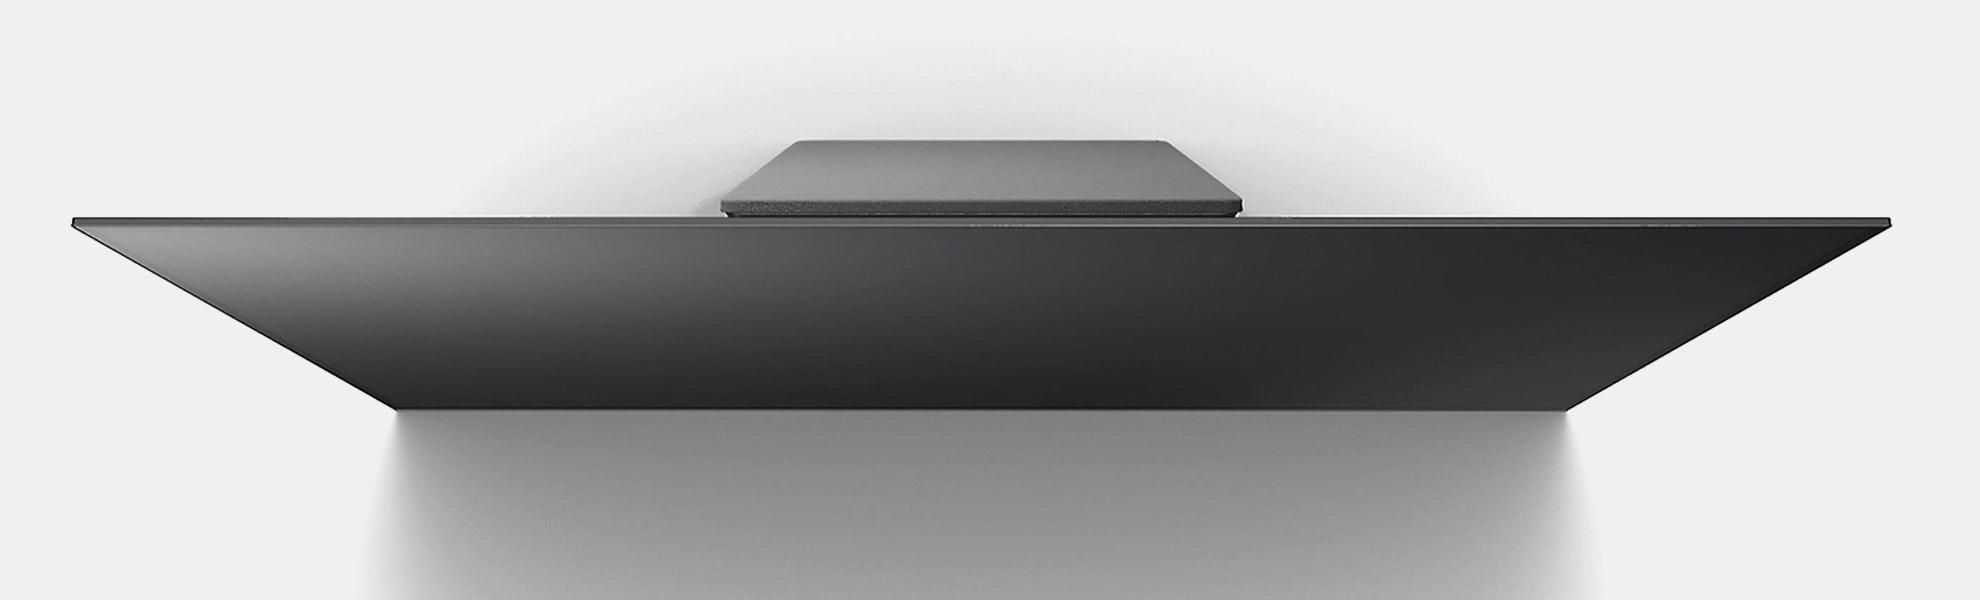 "Sony 65"" A1E 4K Ultra HD HDR Smart Bravia OLED TV"